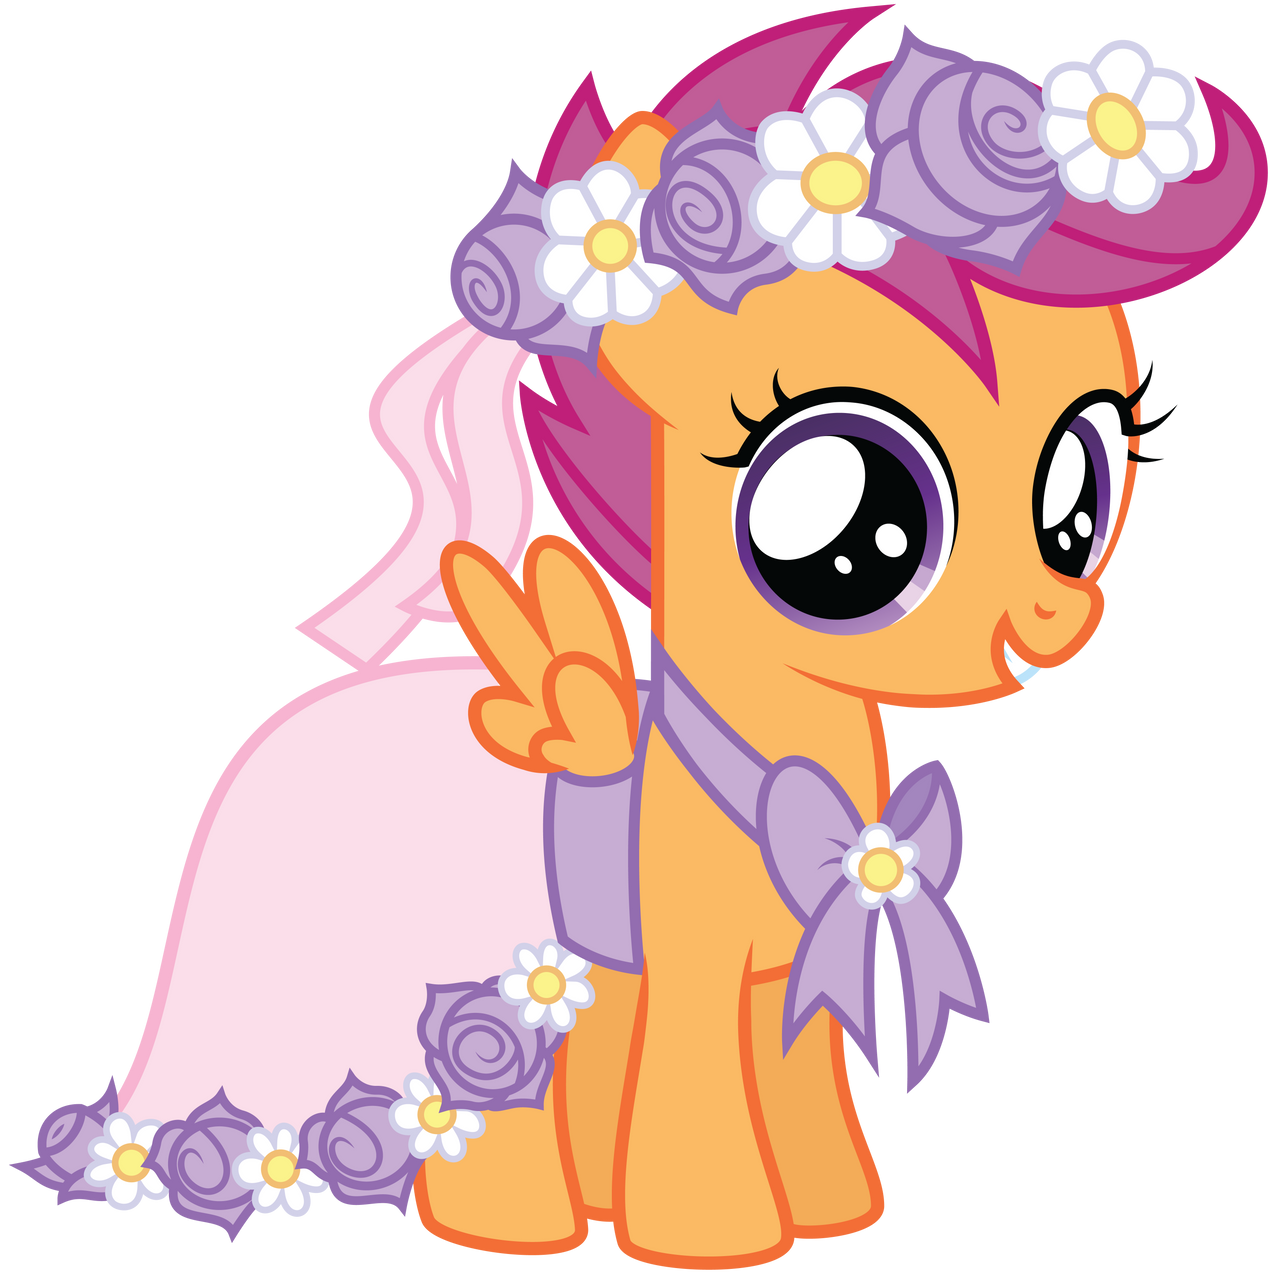 My Little Pony Wedding Flower Fillies: Flower Filly Scootaloo By Midnight--Blitz On DeviantArt